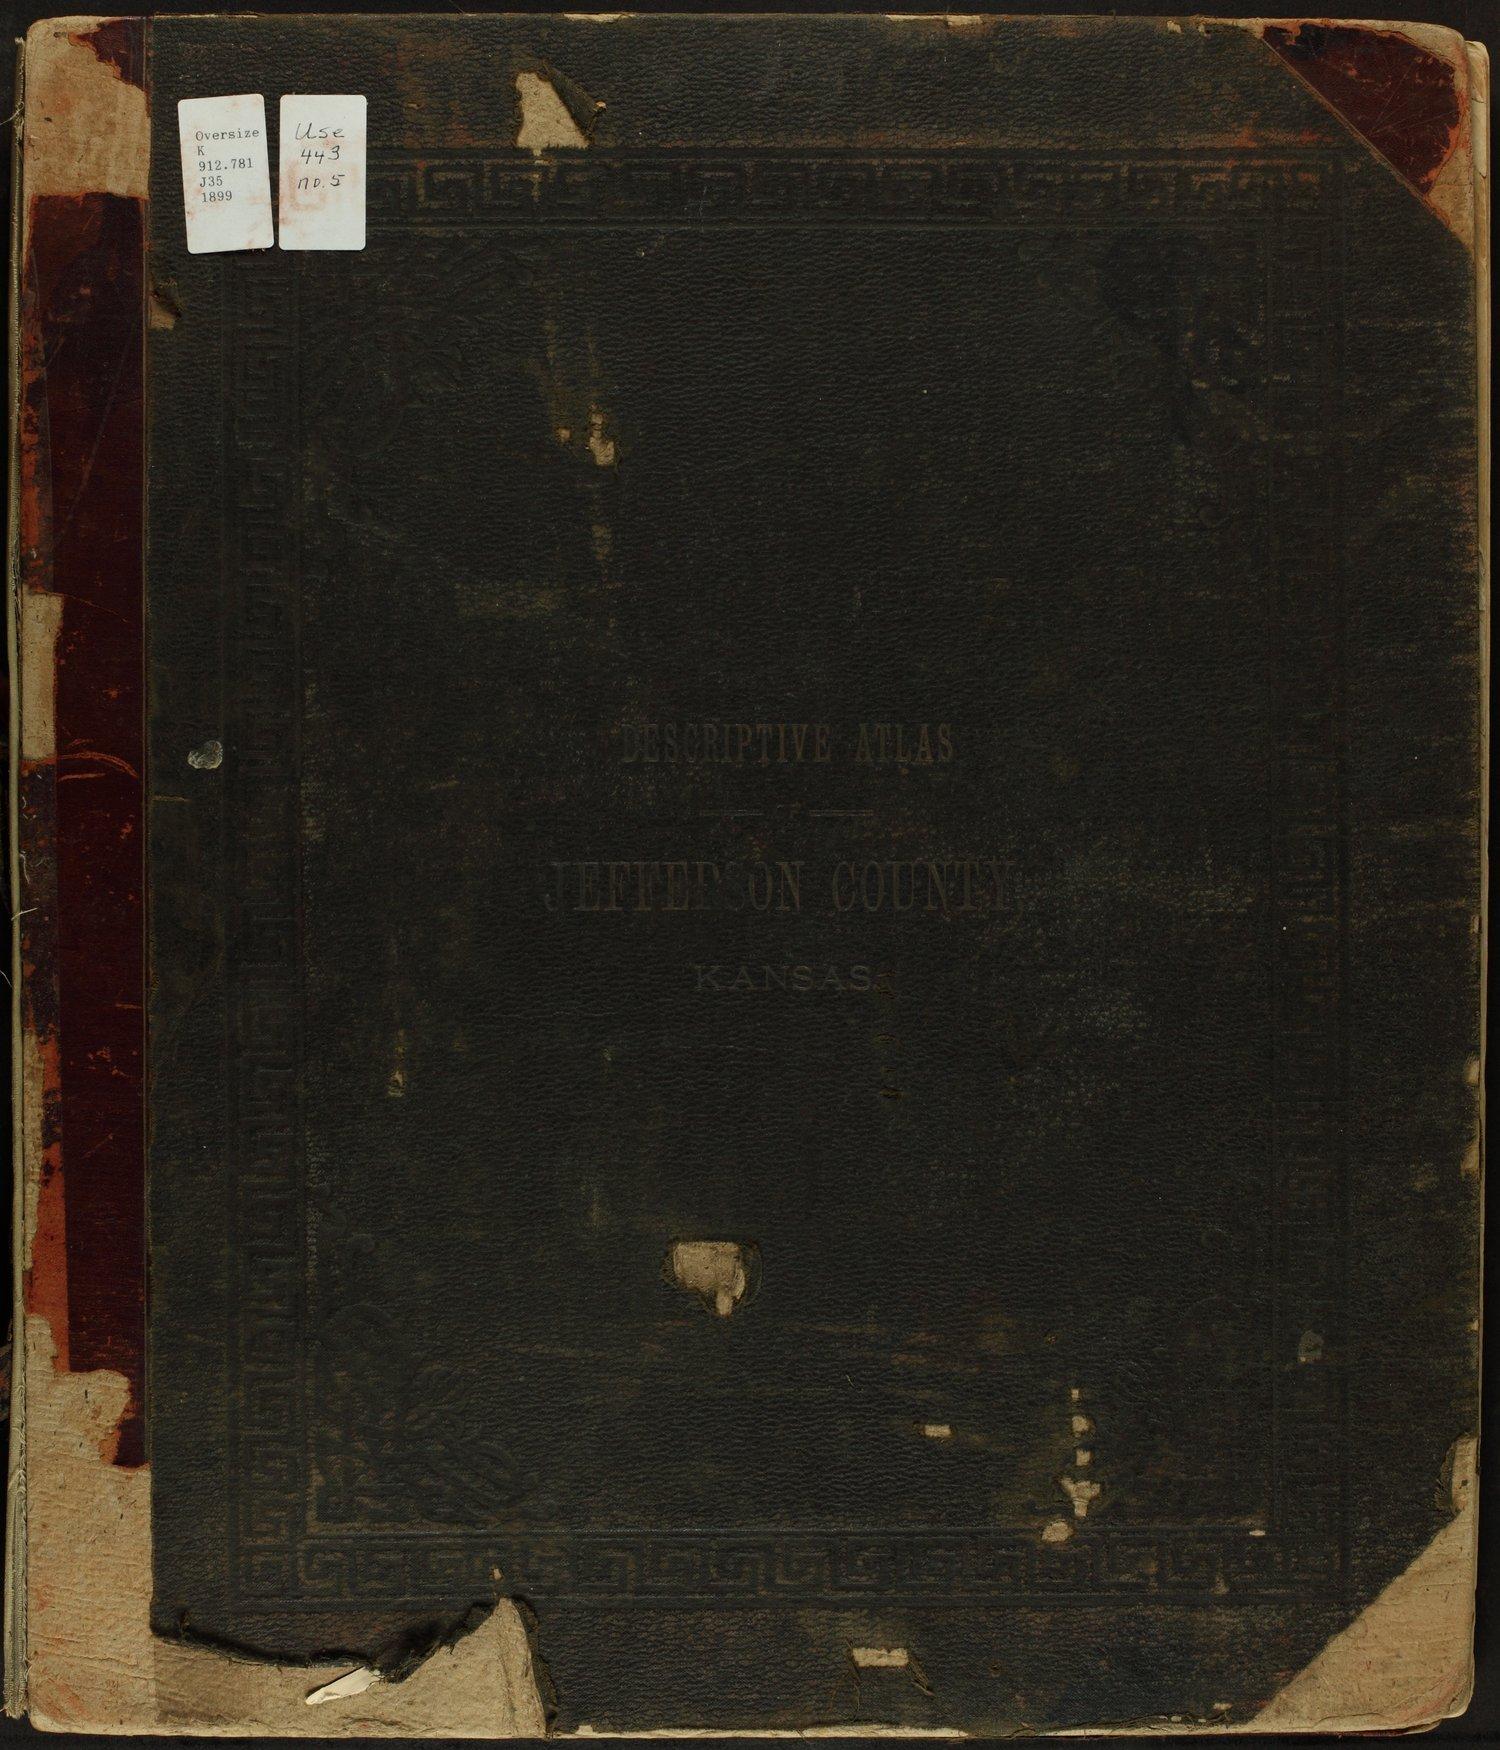 Descriptive atlas of Jefferson County, Kansas - Front Cover